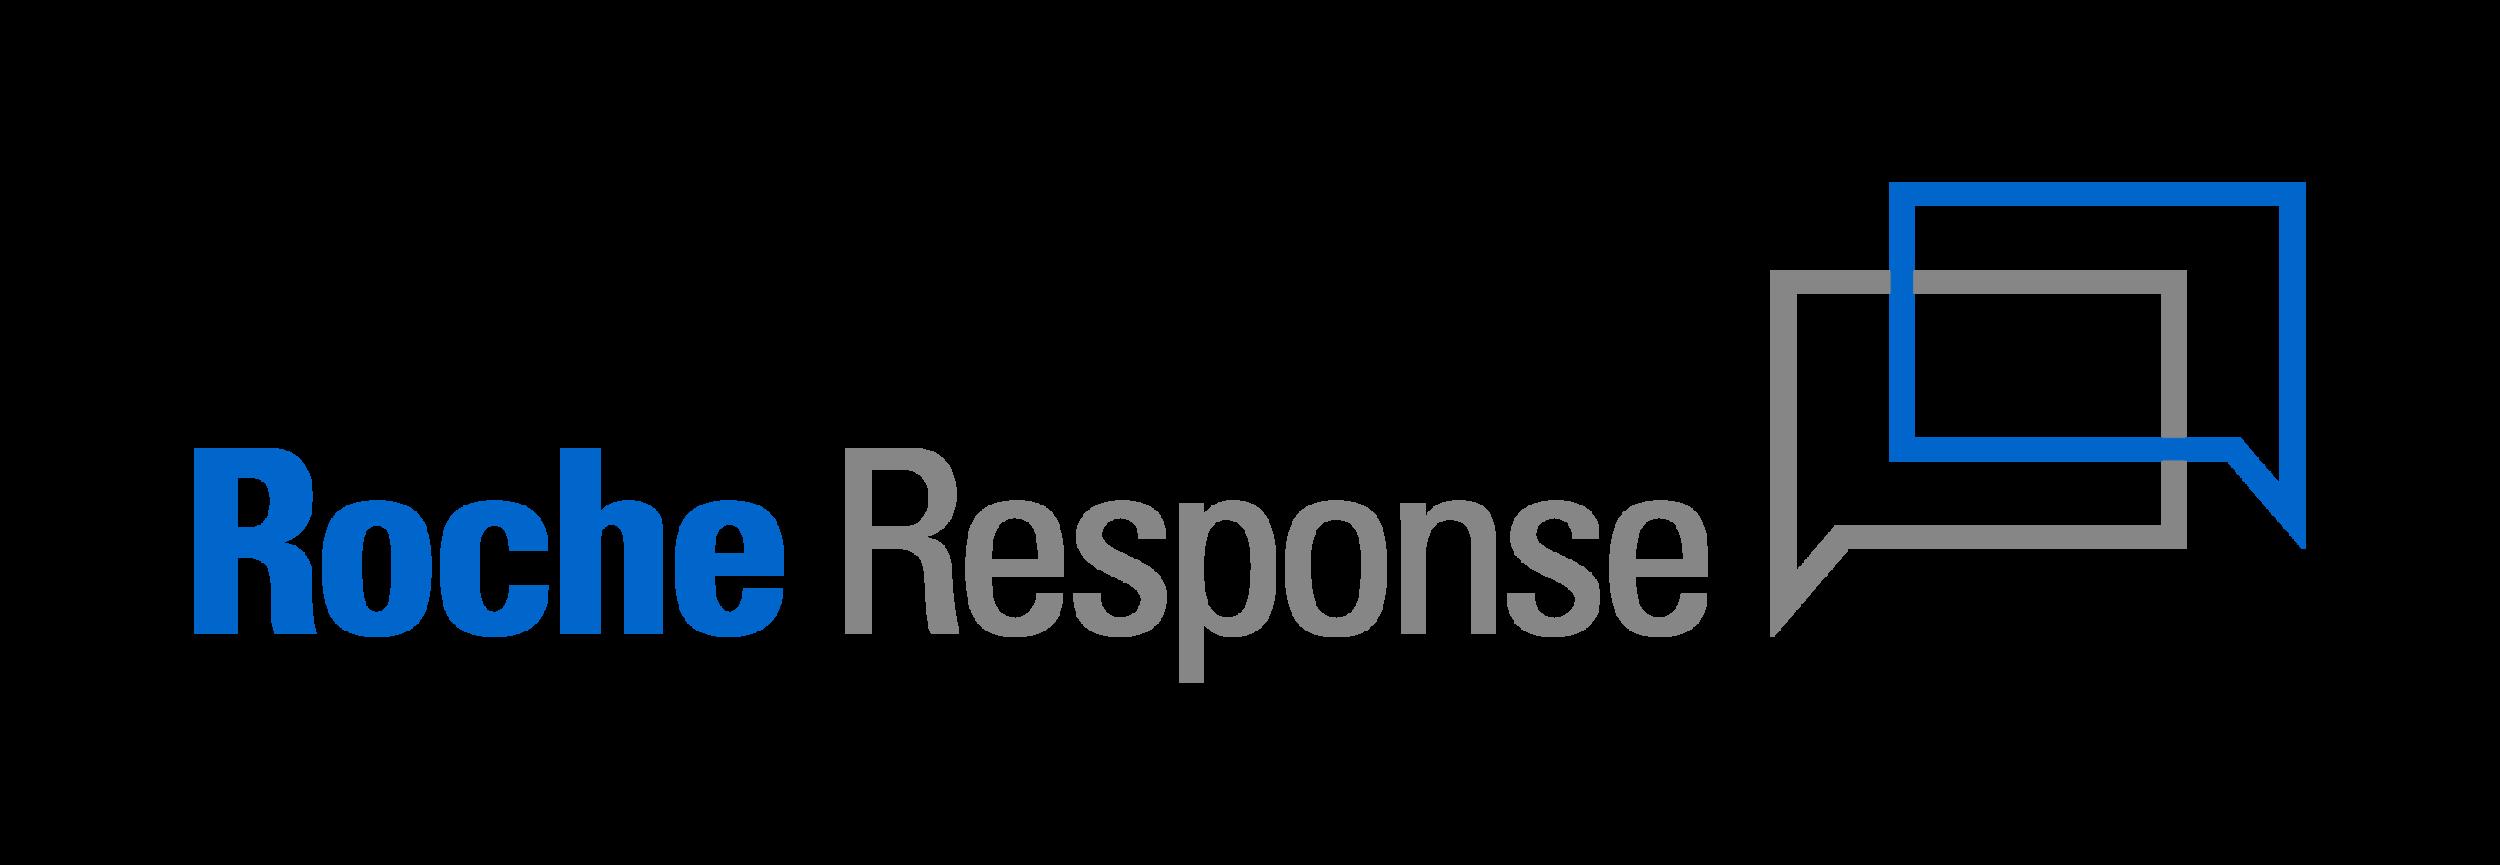 Roche_Response_Digital_02-01.png